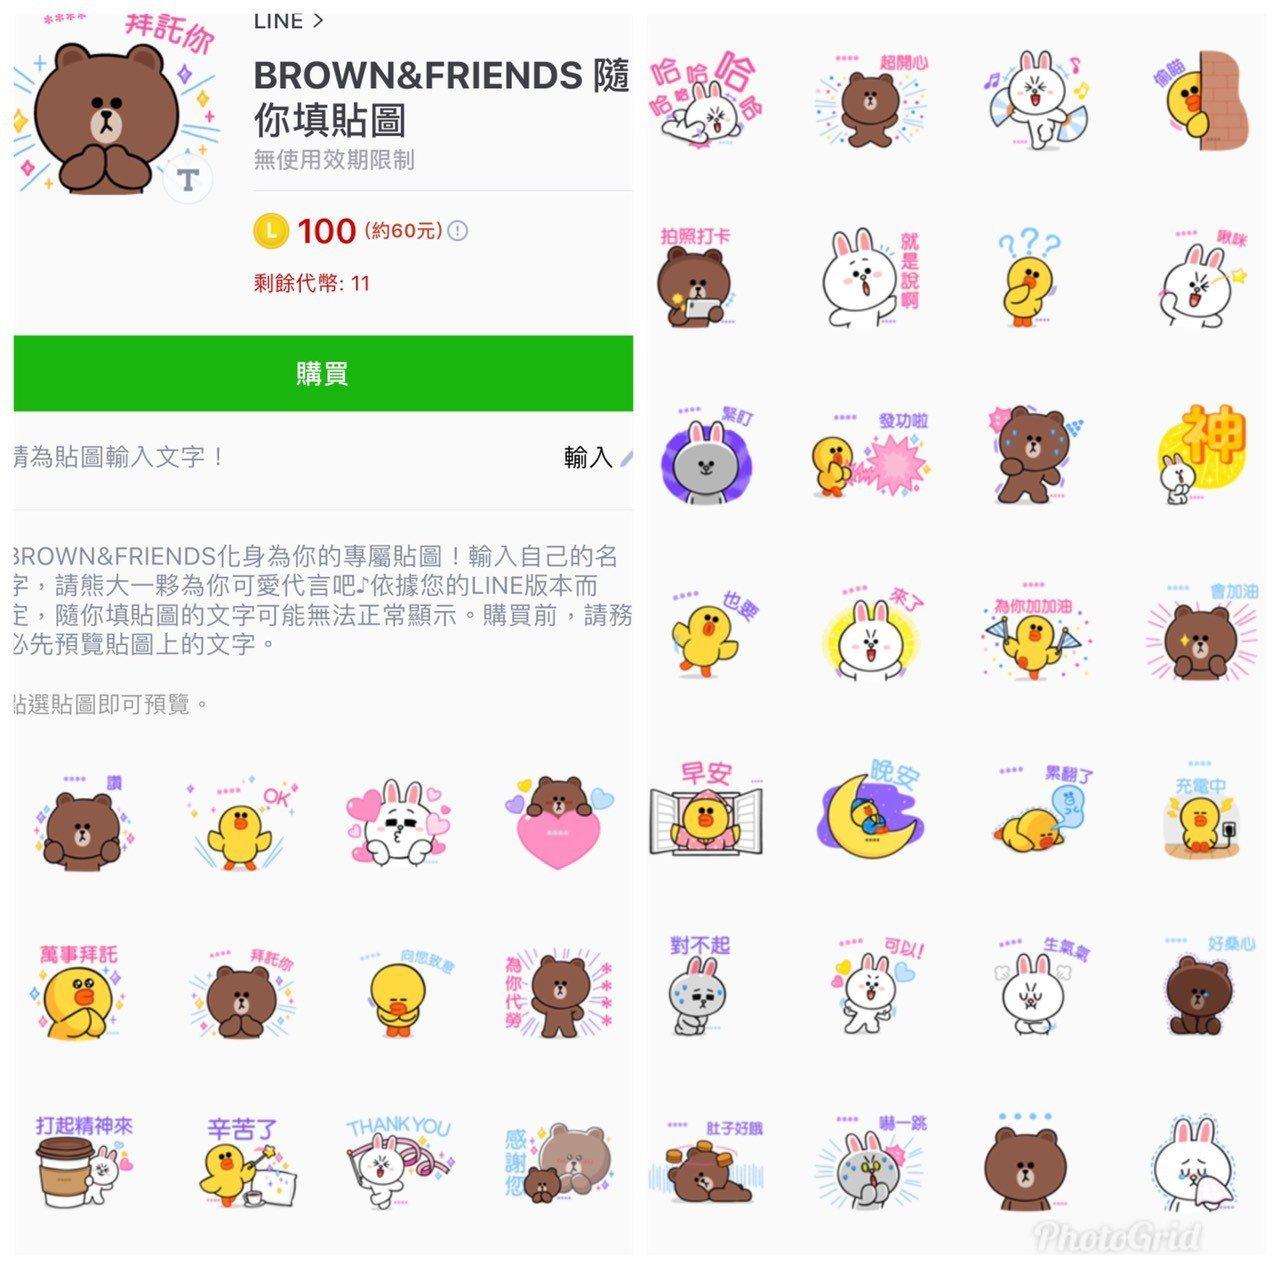 LINE全新的官方貼圖「BROWB&FRIENDS隨你填貼圖」一推出就登上熱門貼...